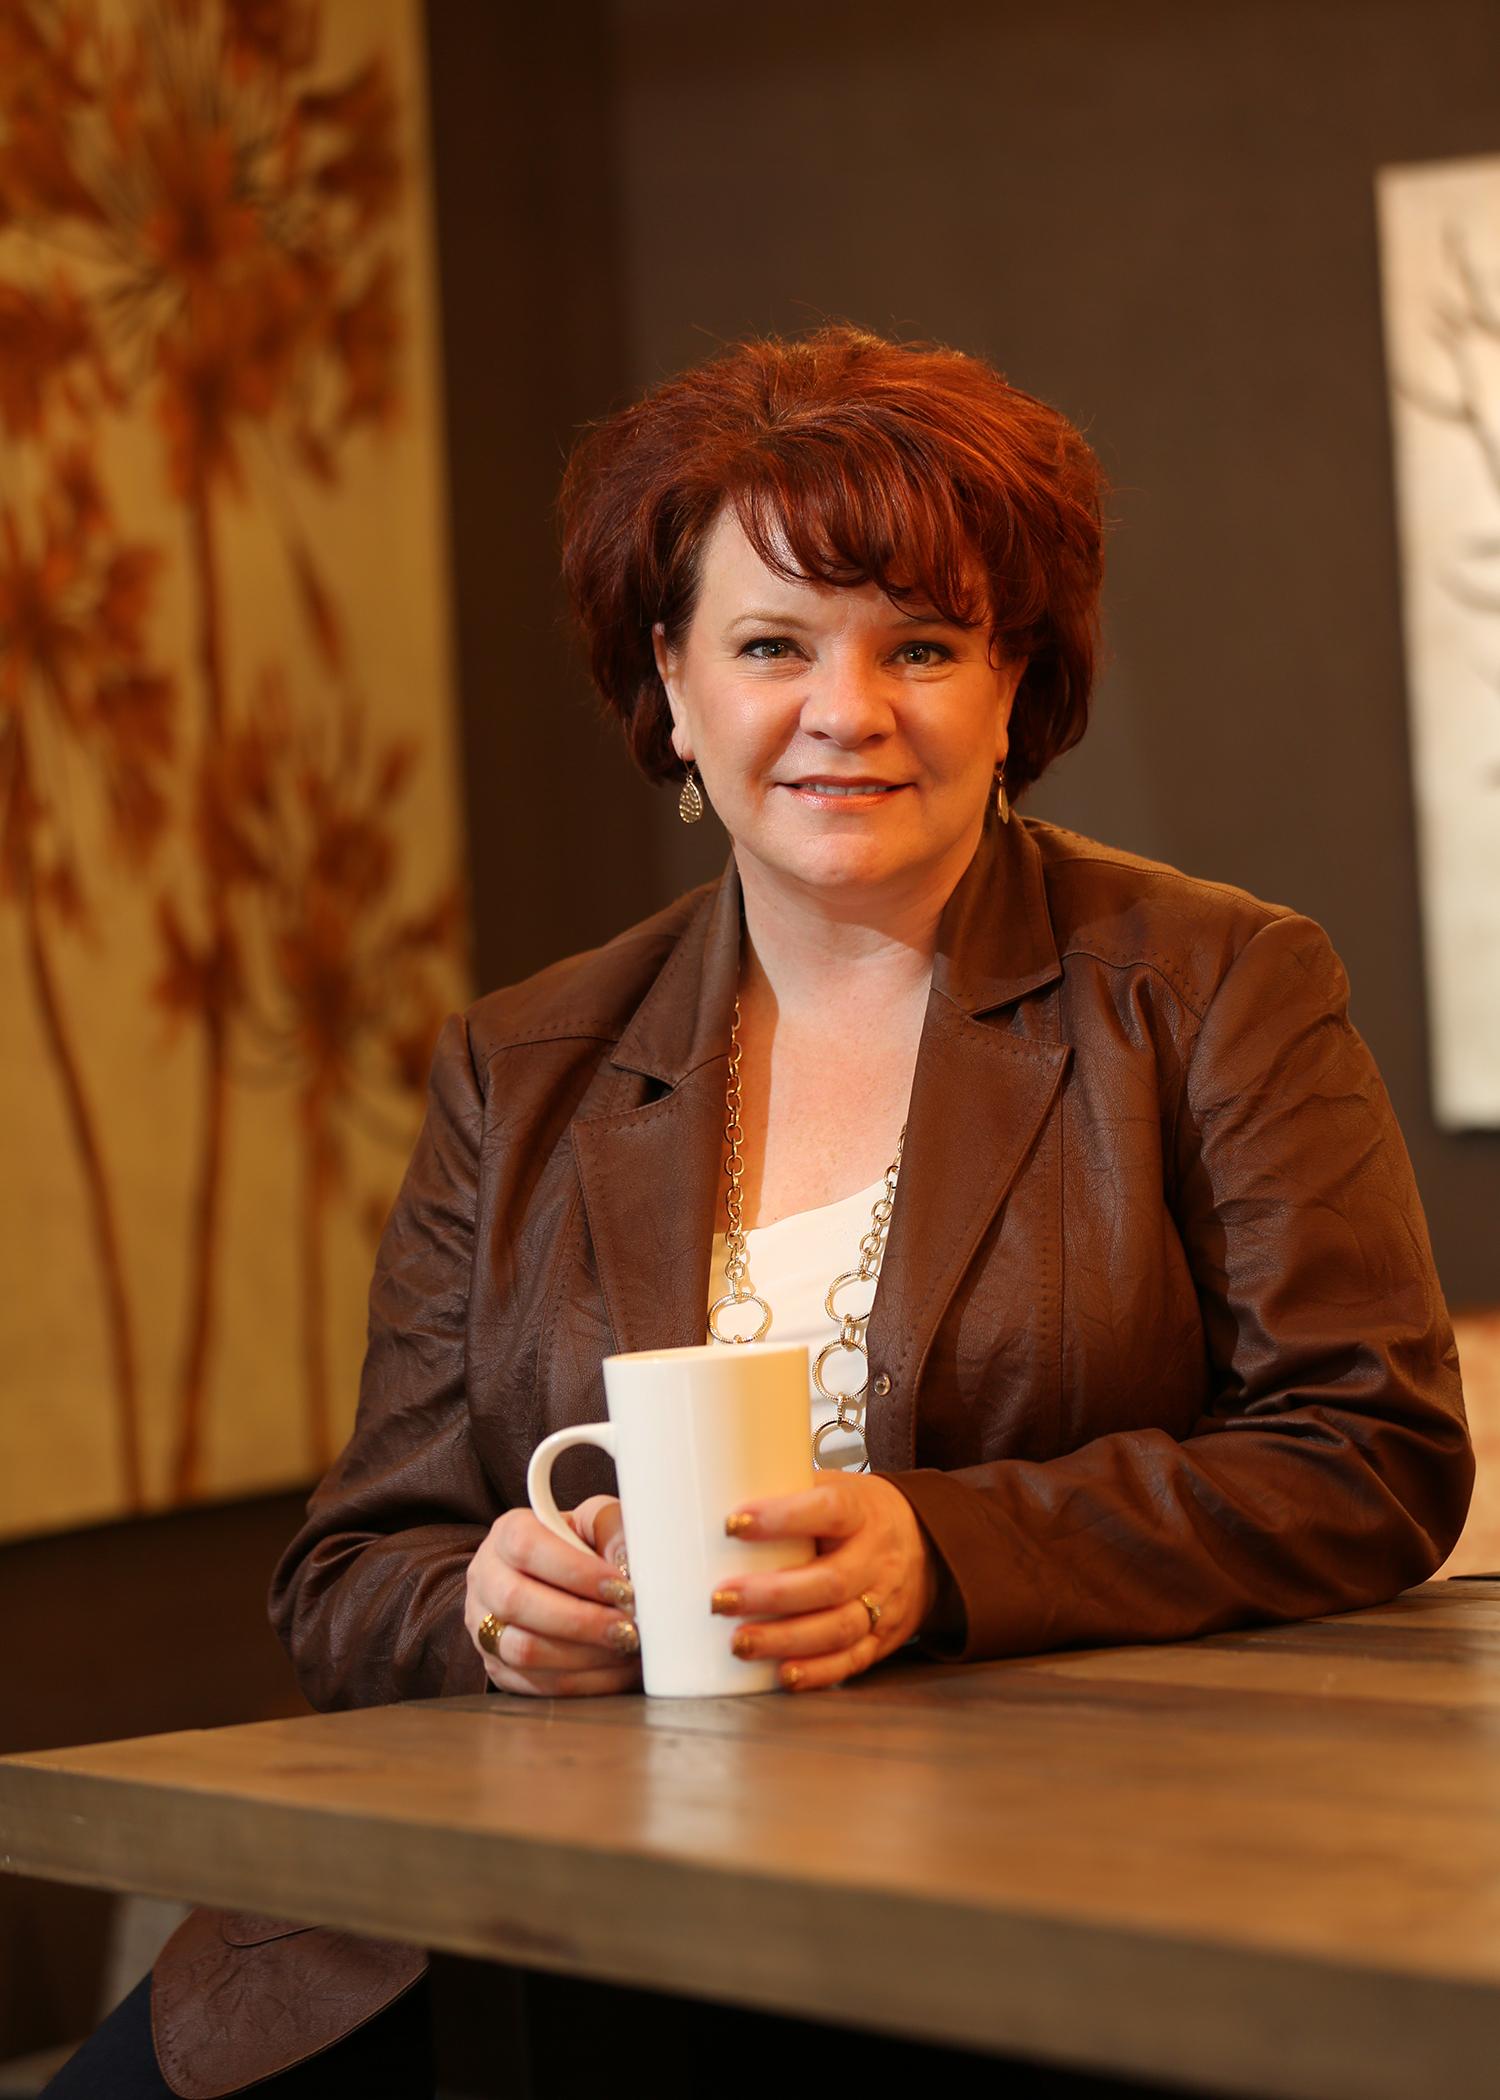 Jill Poulton | Transformational Leadership Coach